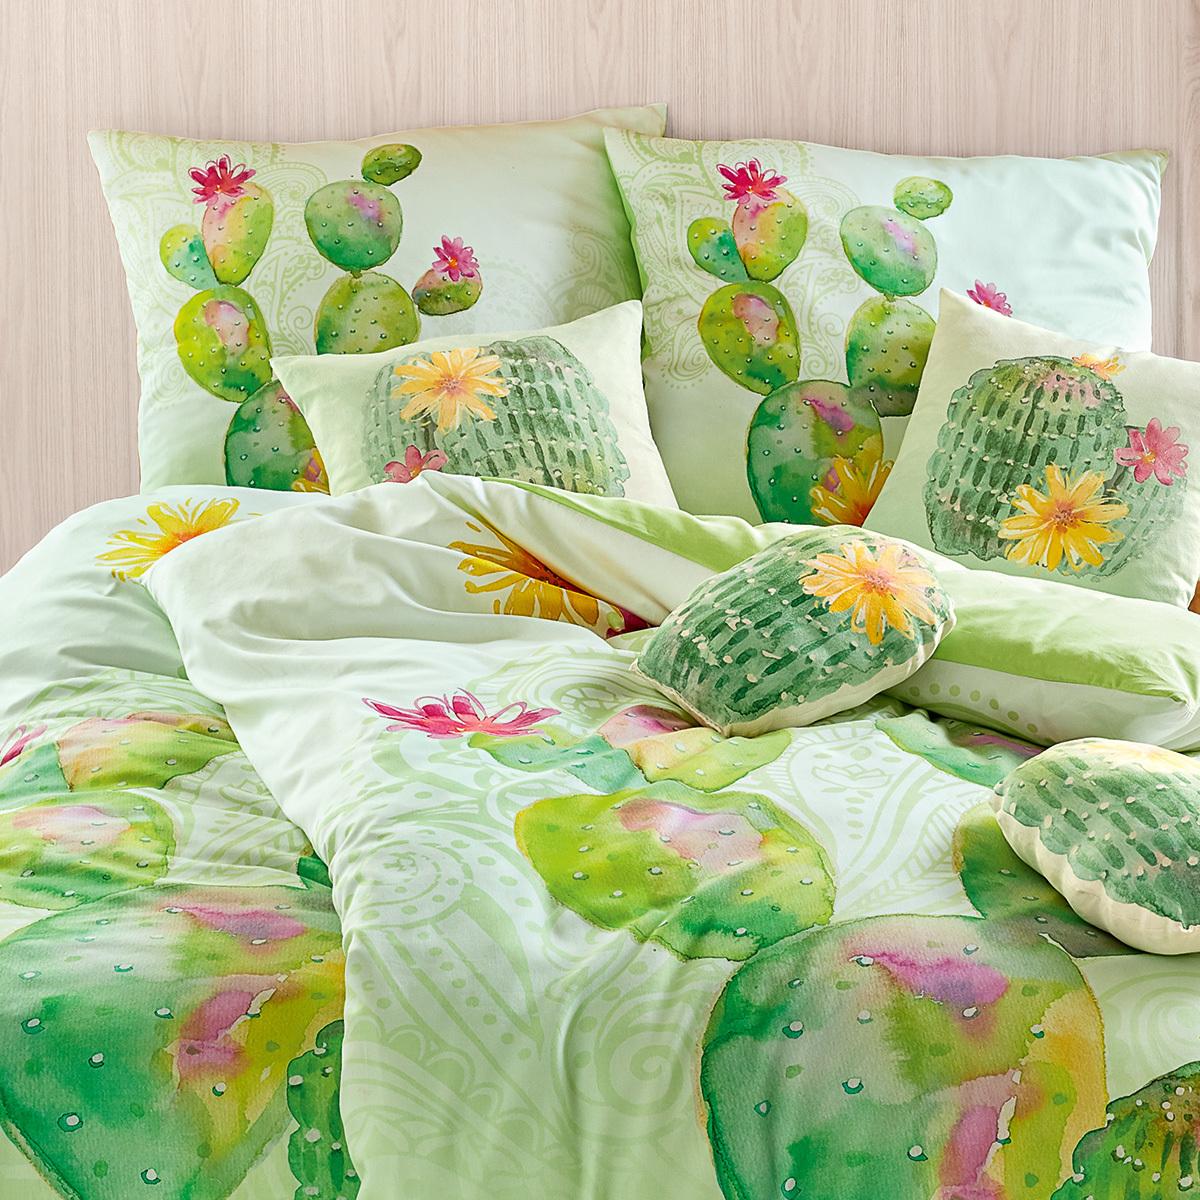 living dreams mako satin wendebettw sche kaktus g nstig online kaufen bei bettwaren shop. Black Bedroom Furniture Sets. Home Design Ideas